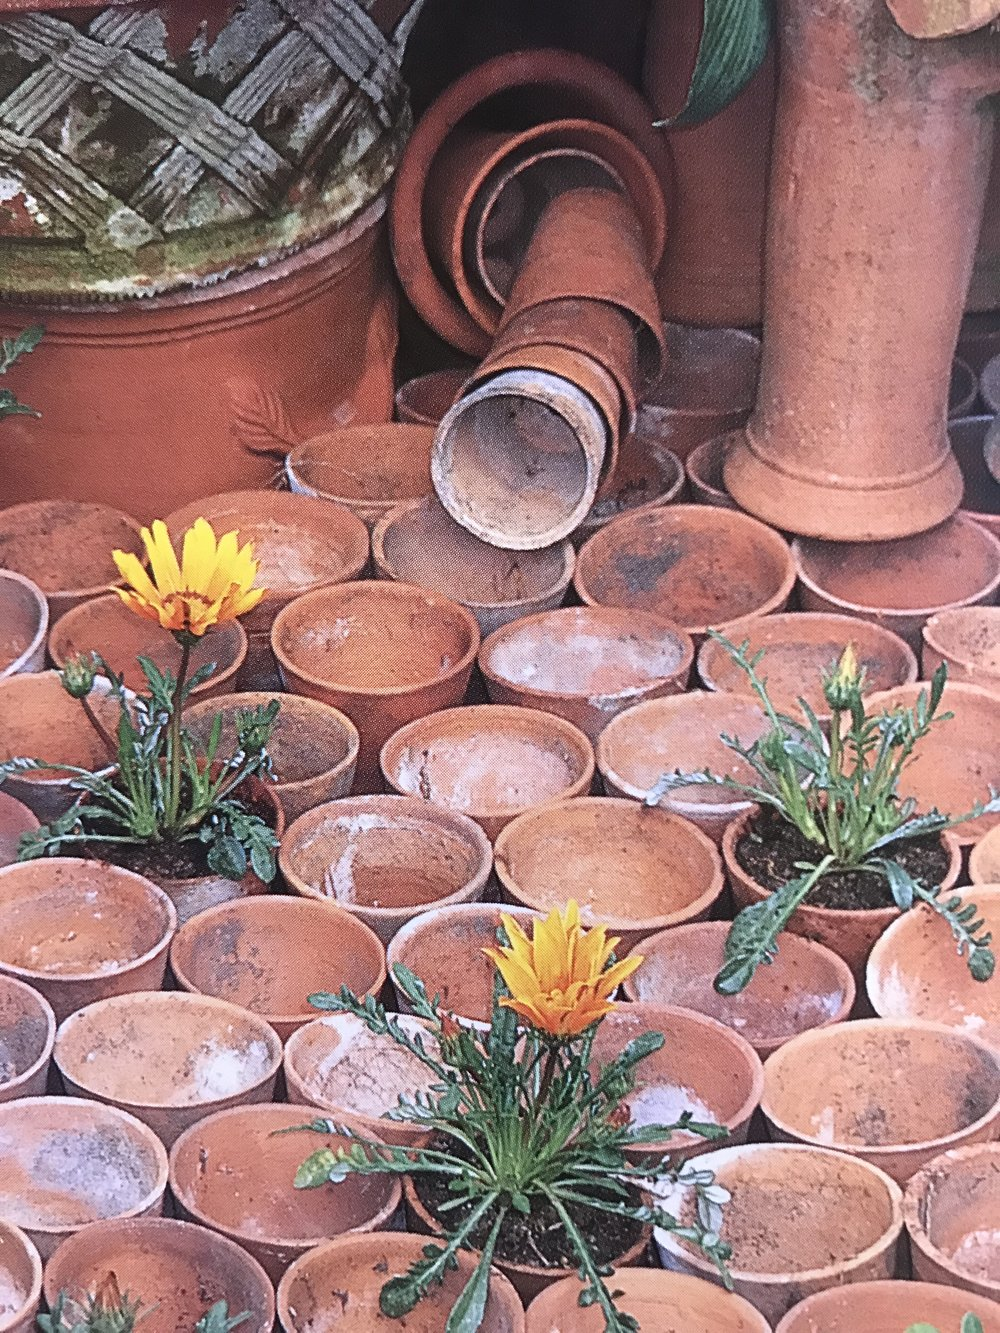 Terracotta pots in one corner